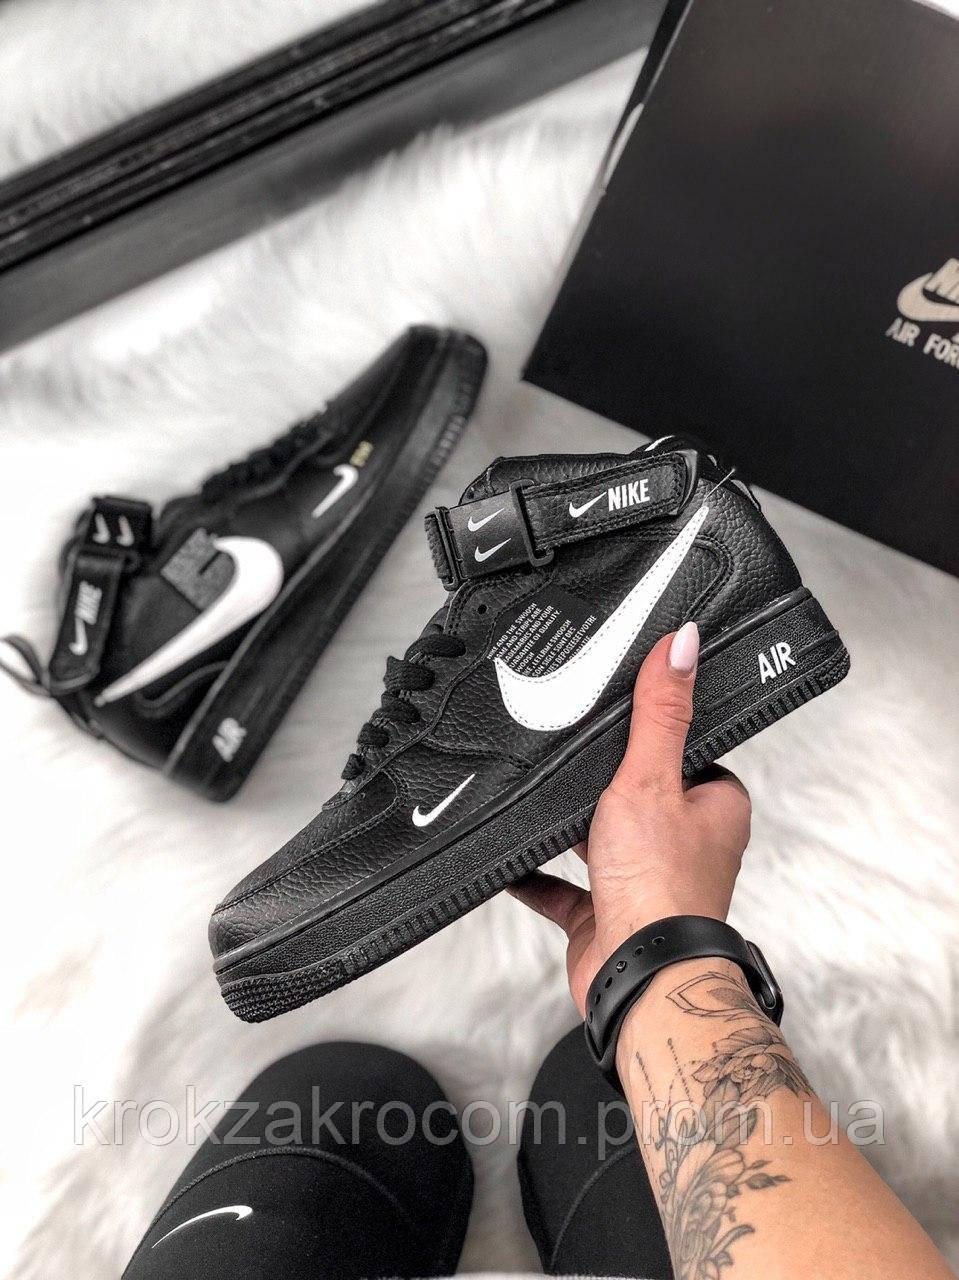 3eb78eda Кроссовки Nike Air Force 1 High Black replica AAA - Интернет-магазин